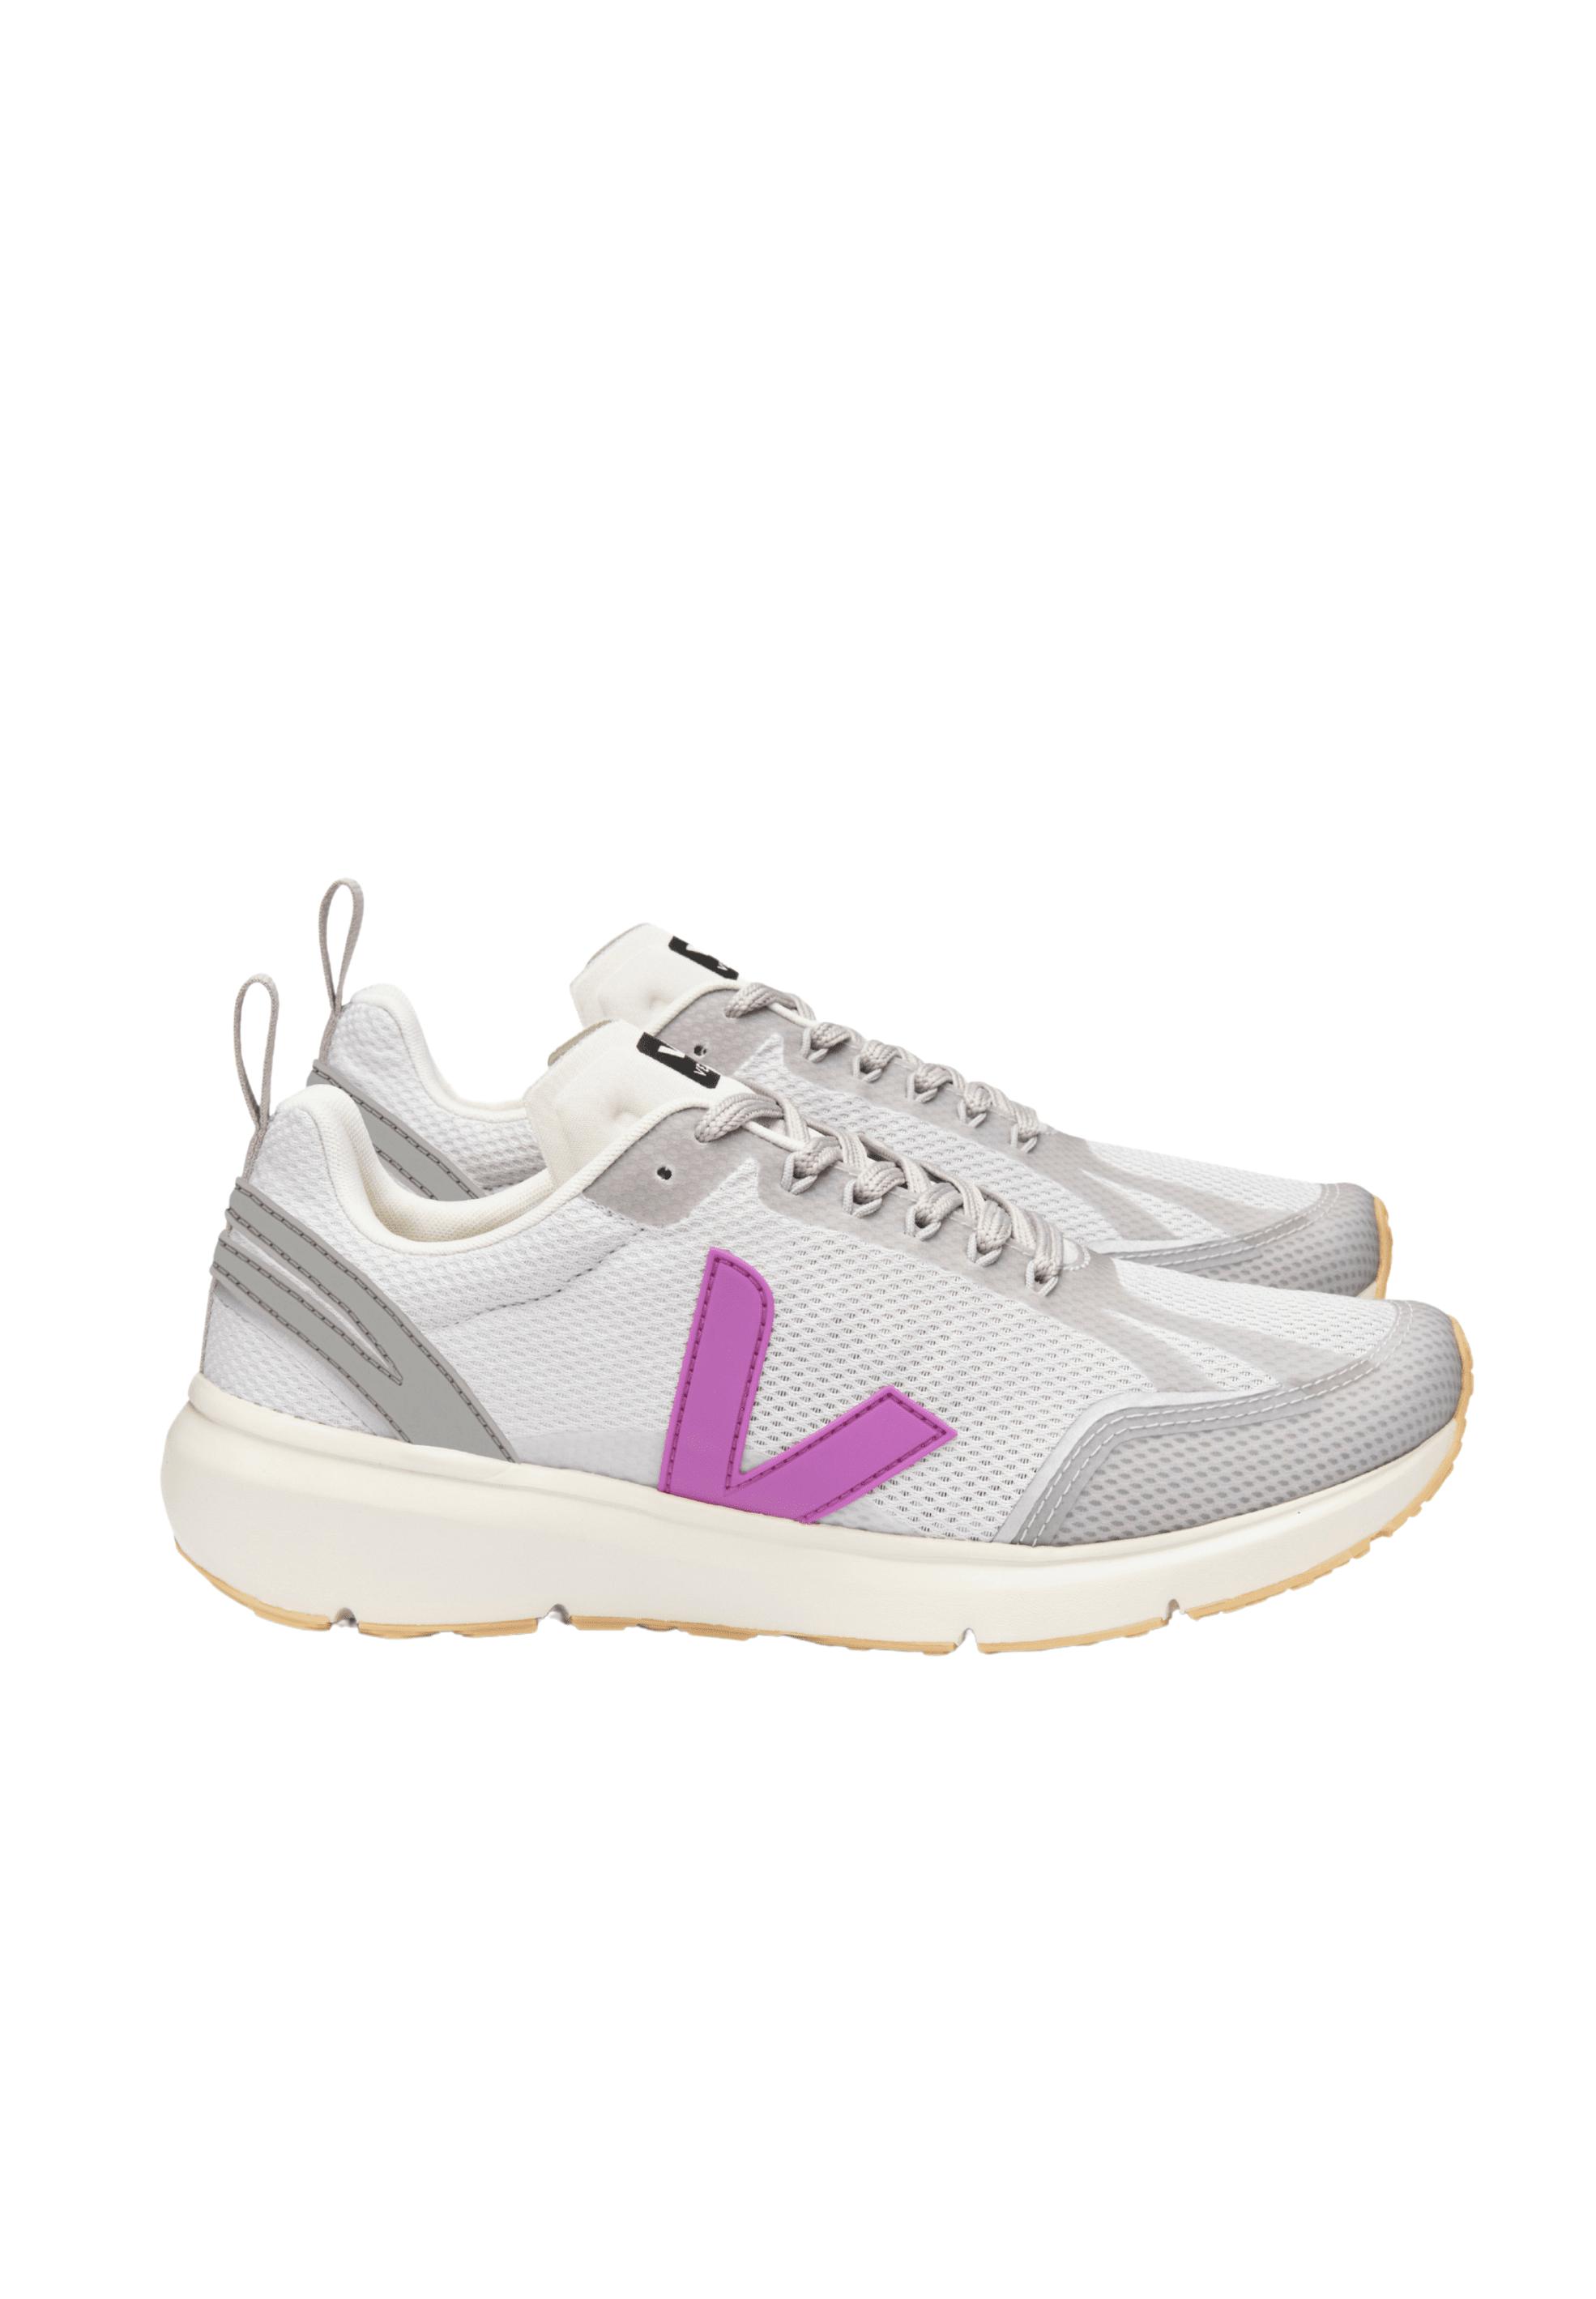 Condor 2 Alveomesh Women Running Shoe Light Grey Ultraviolet